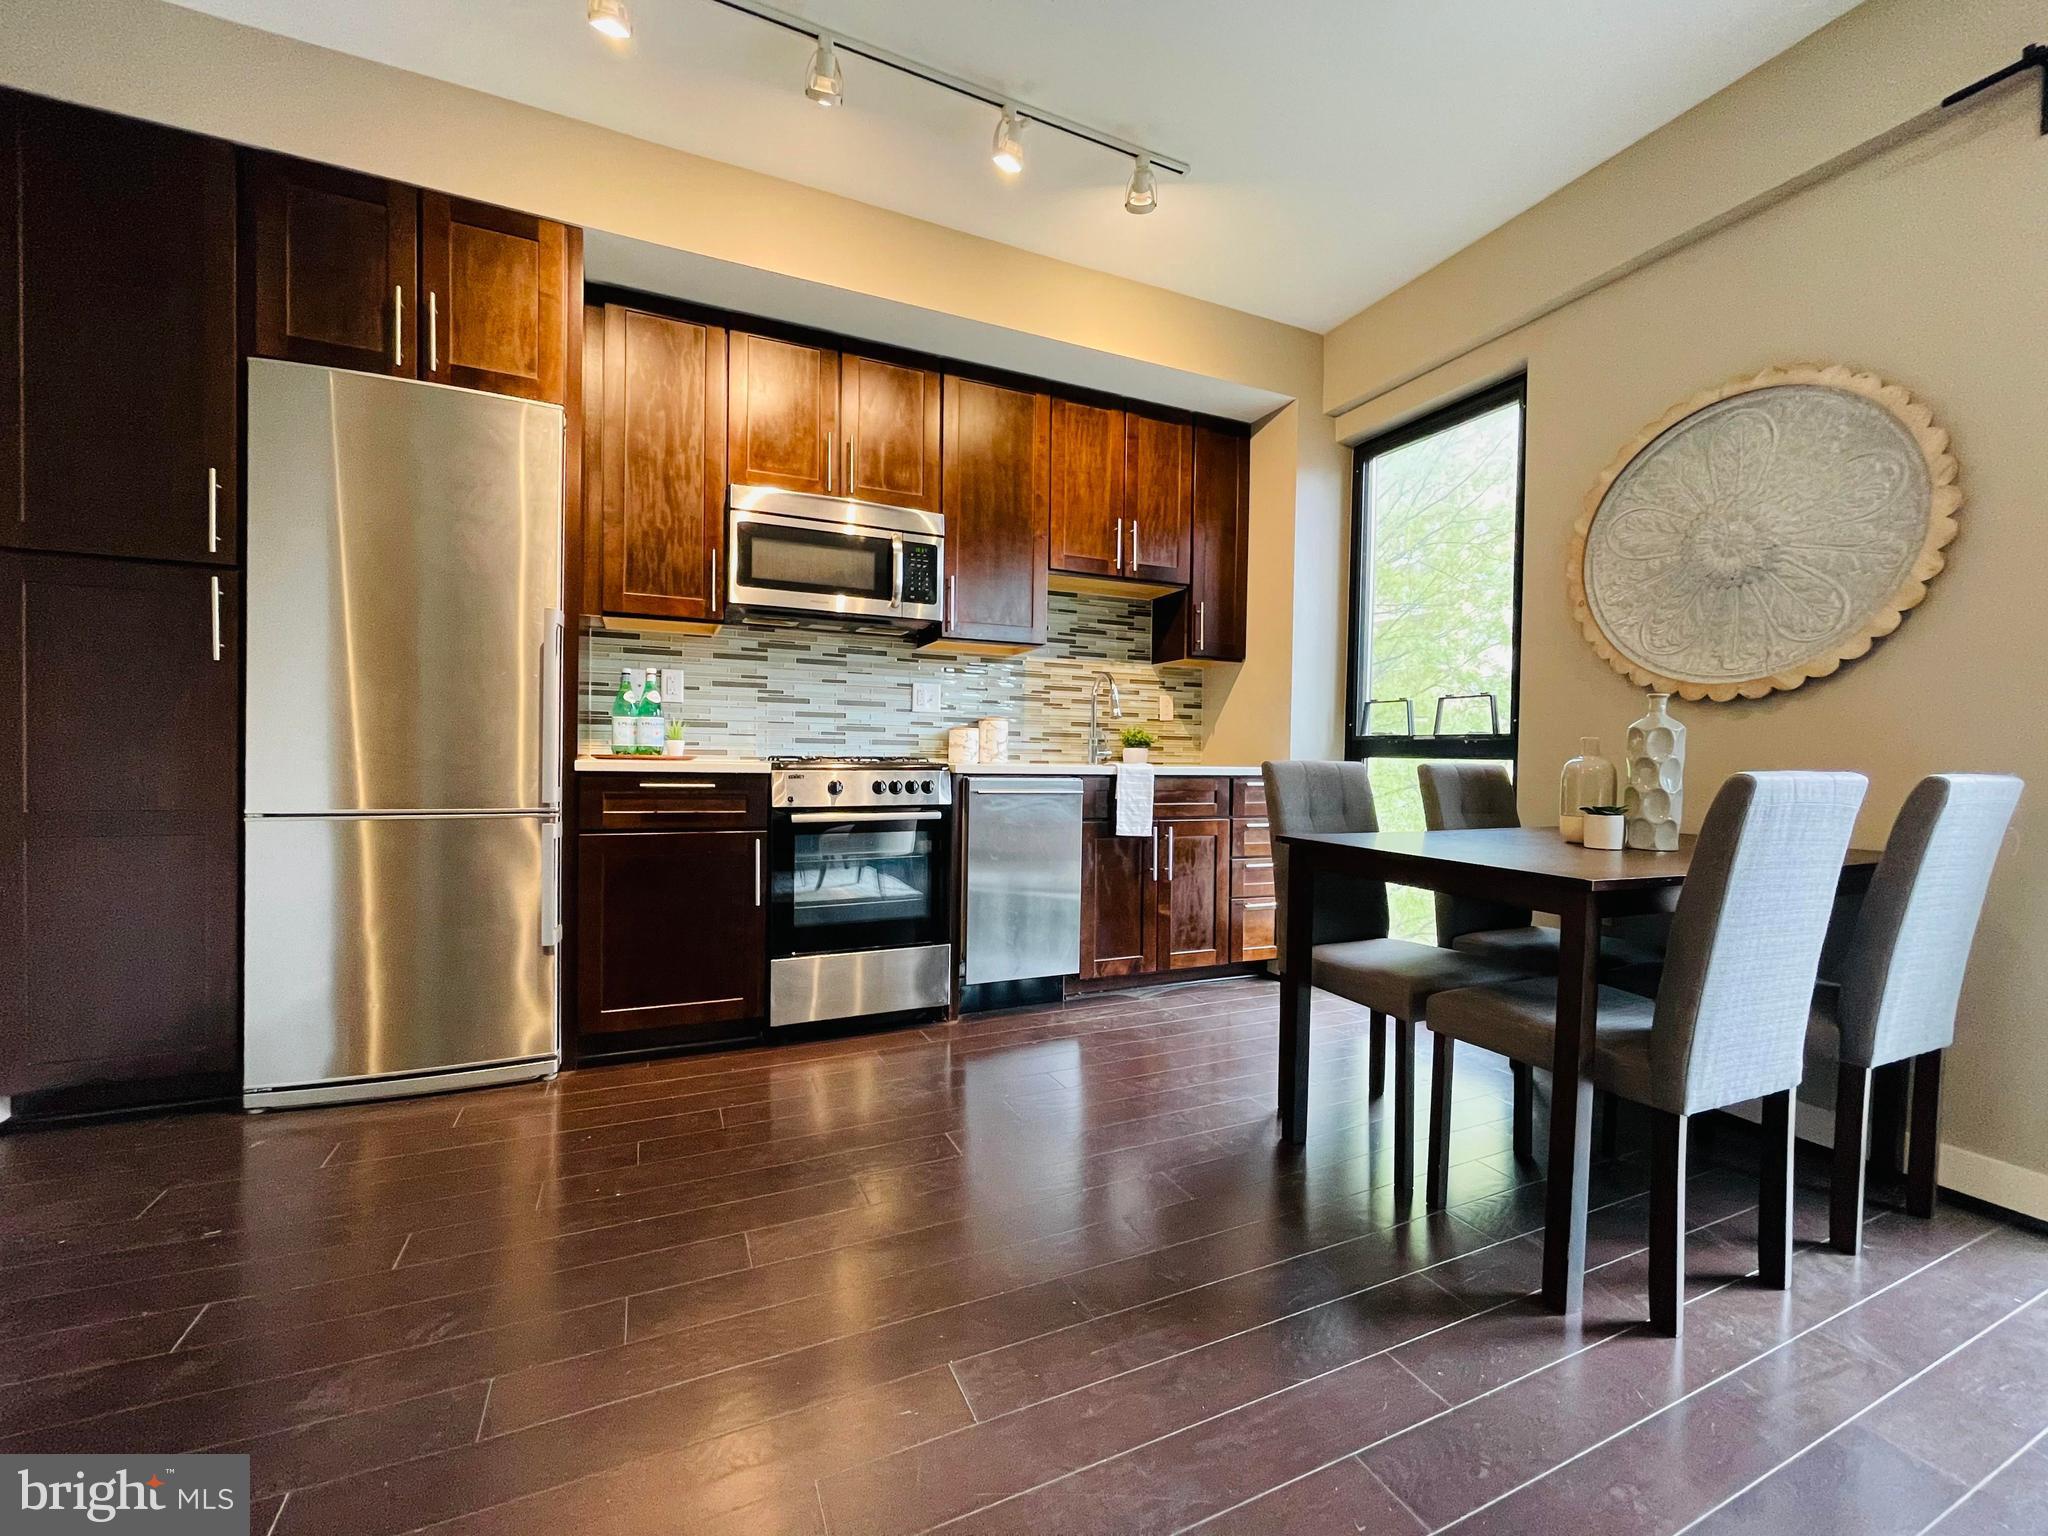 1320 FENWICK LANE, SILVER SPRING, Maryland 20910, 1 Bedroom Bedrooms, ,1 BathroomBathrooms,Condominium,For Sale,1320 FENWICK LANE,MDMC743536